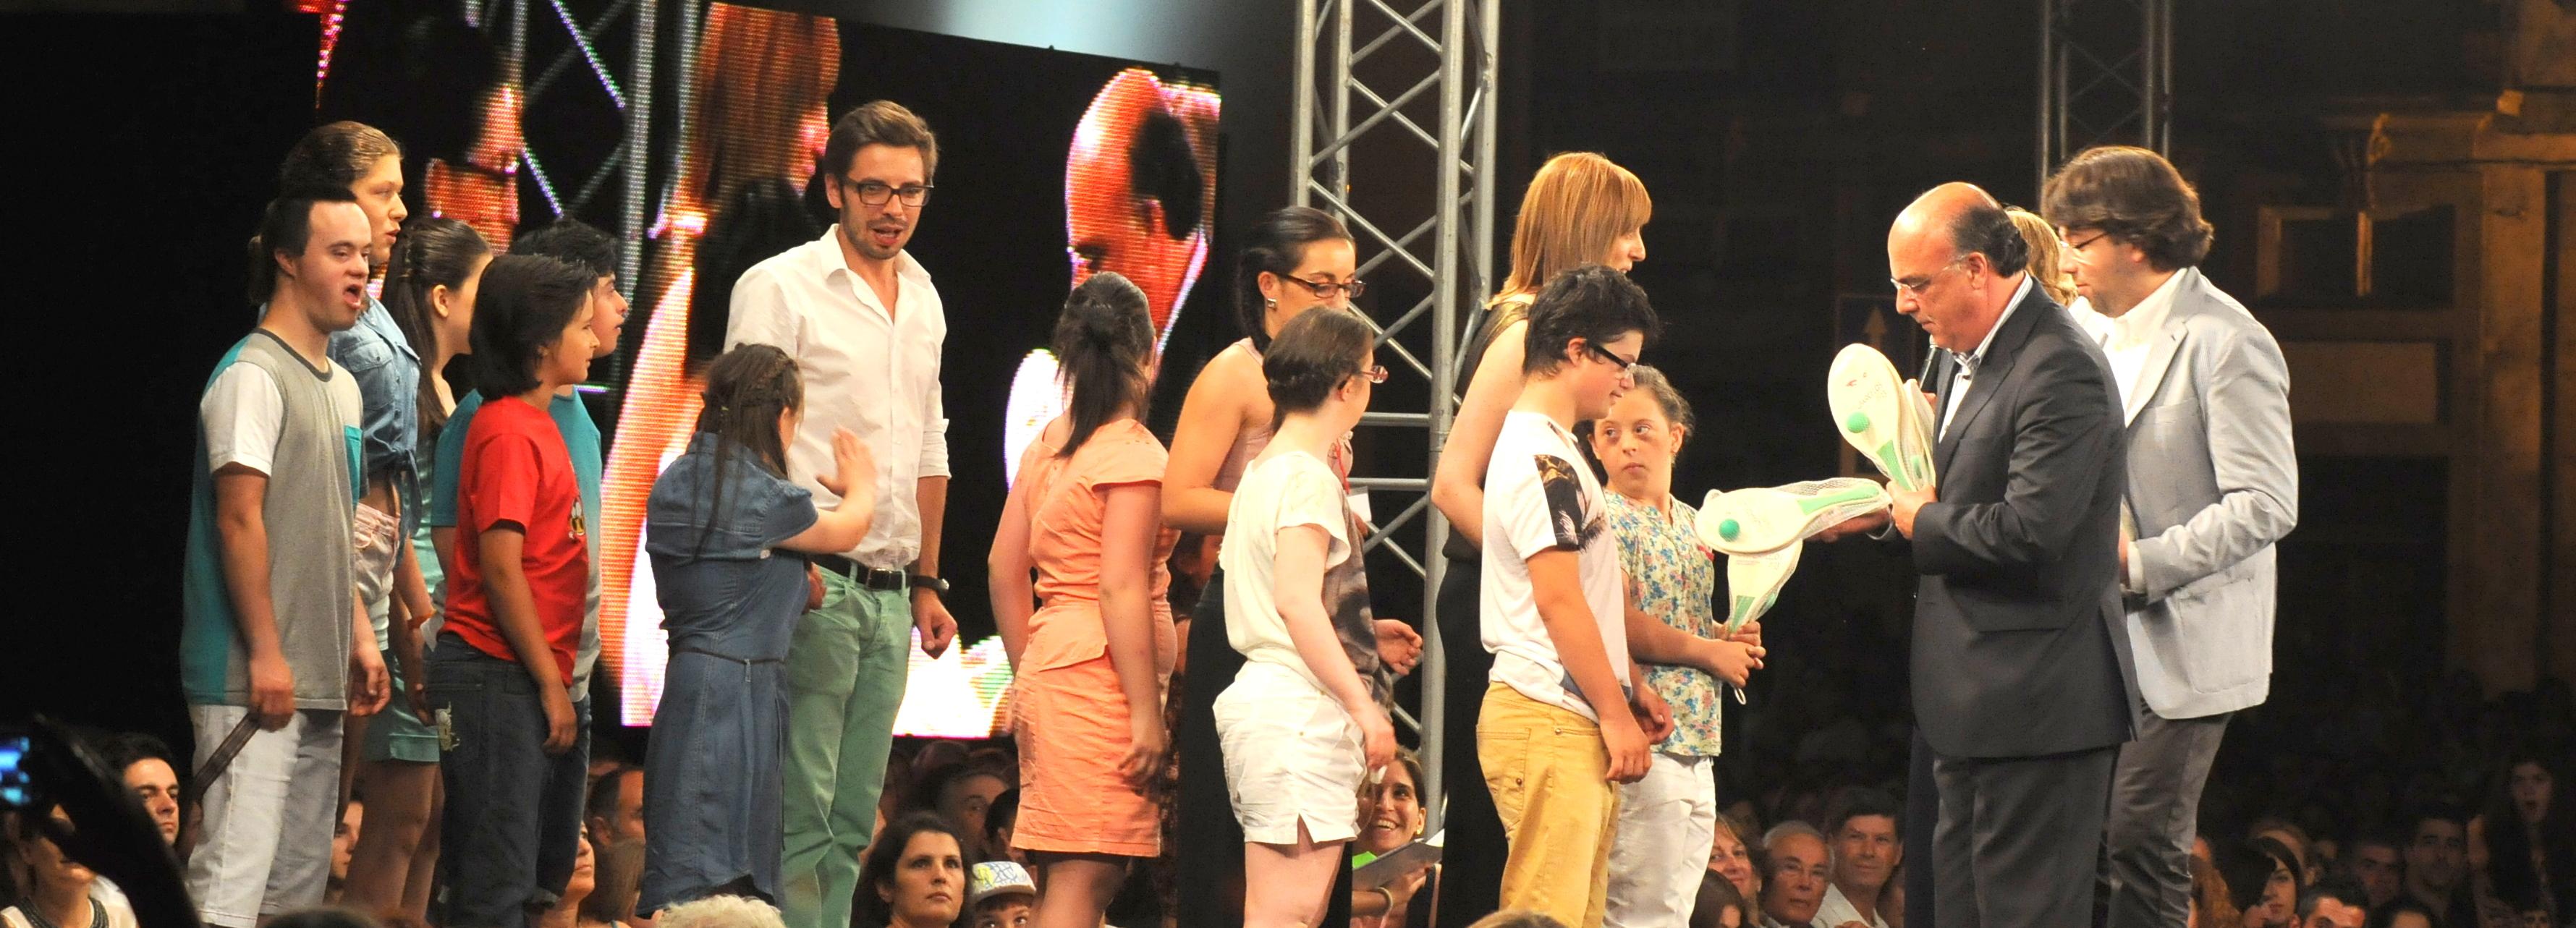 Barcelenses aplaudiram os desfiles da Moda Barcelos